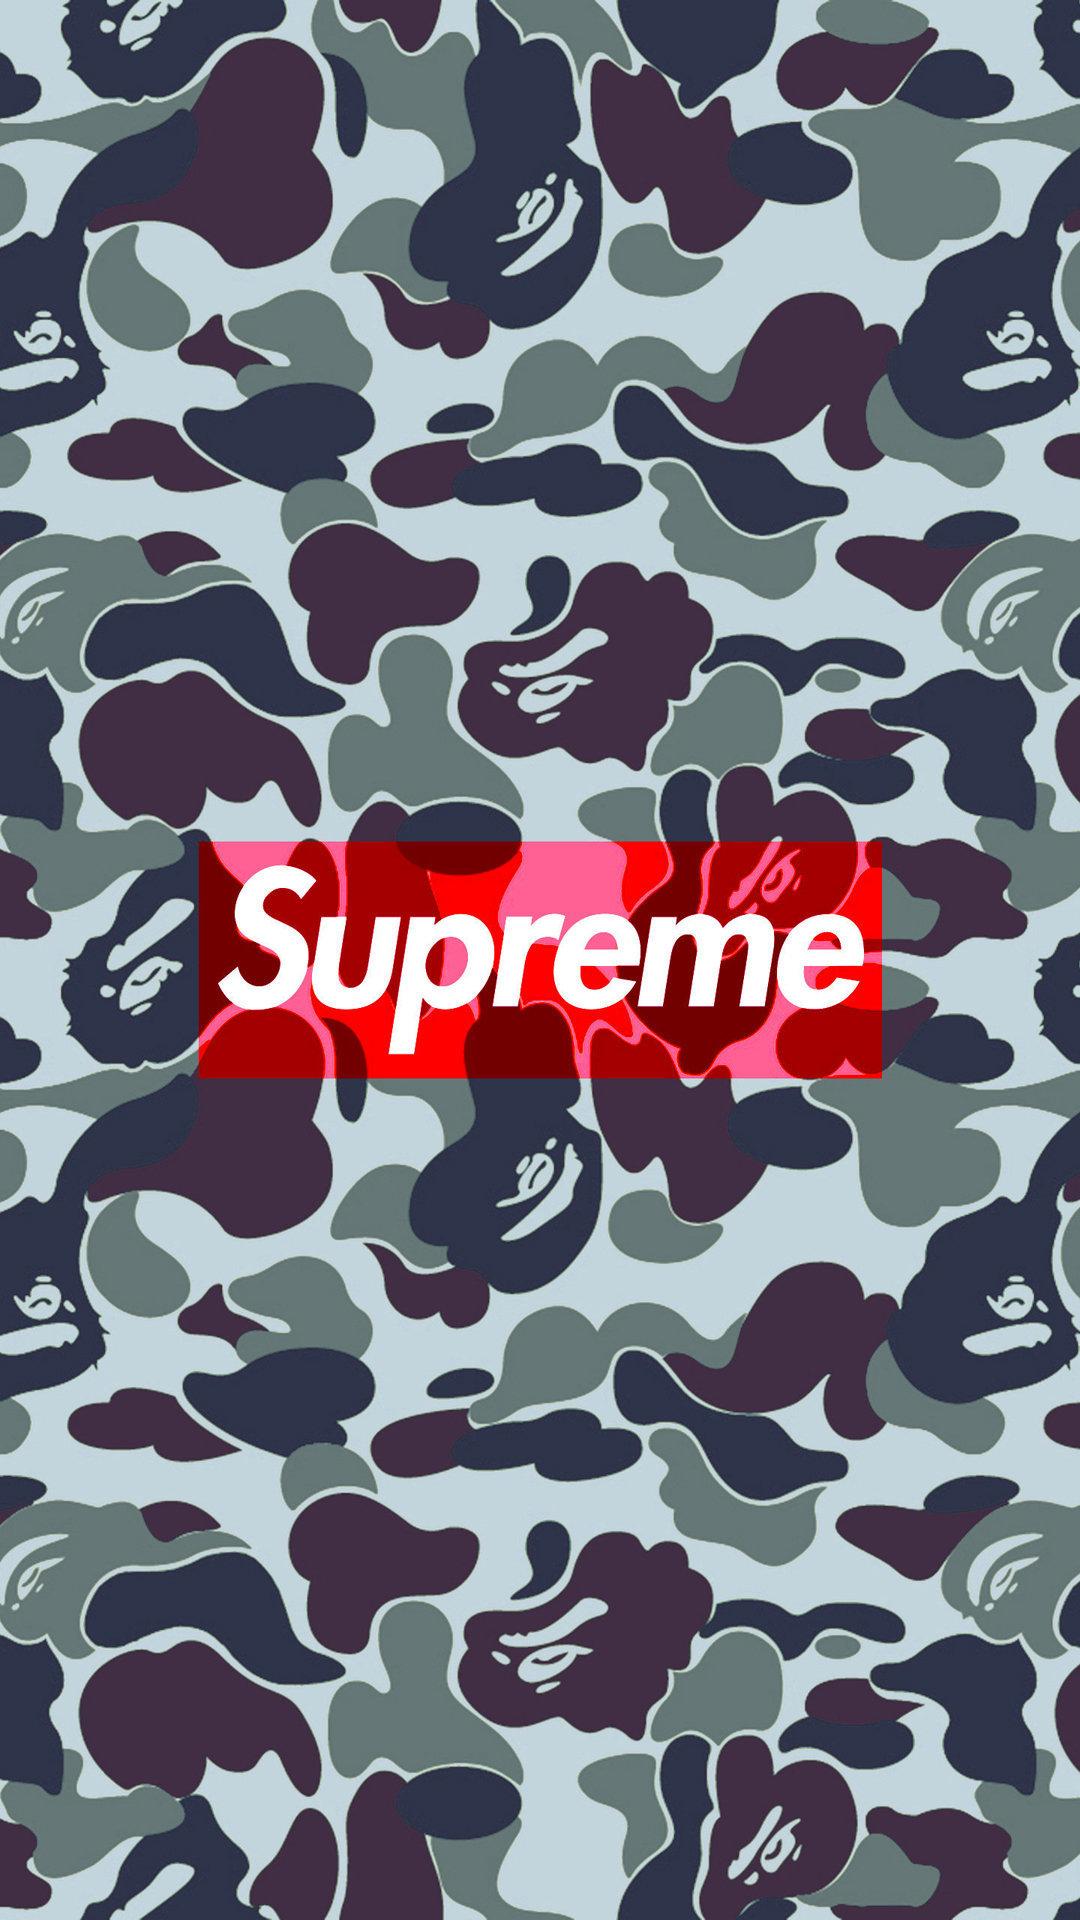 Bape Camo Supreme iPhone Wallpaper HD 1080x1920